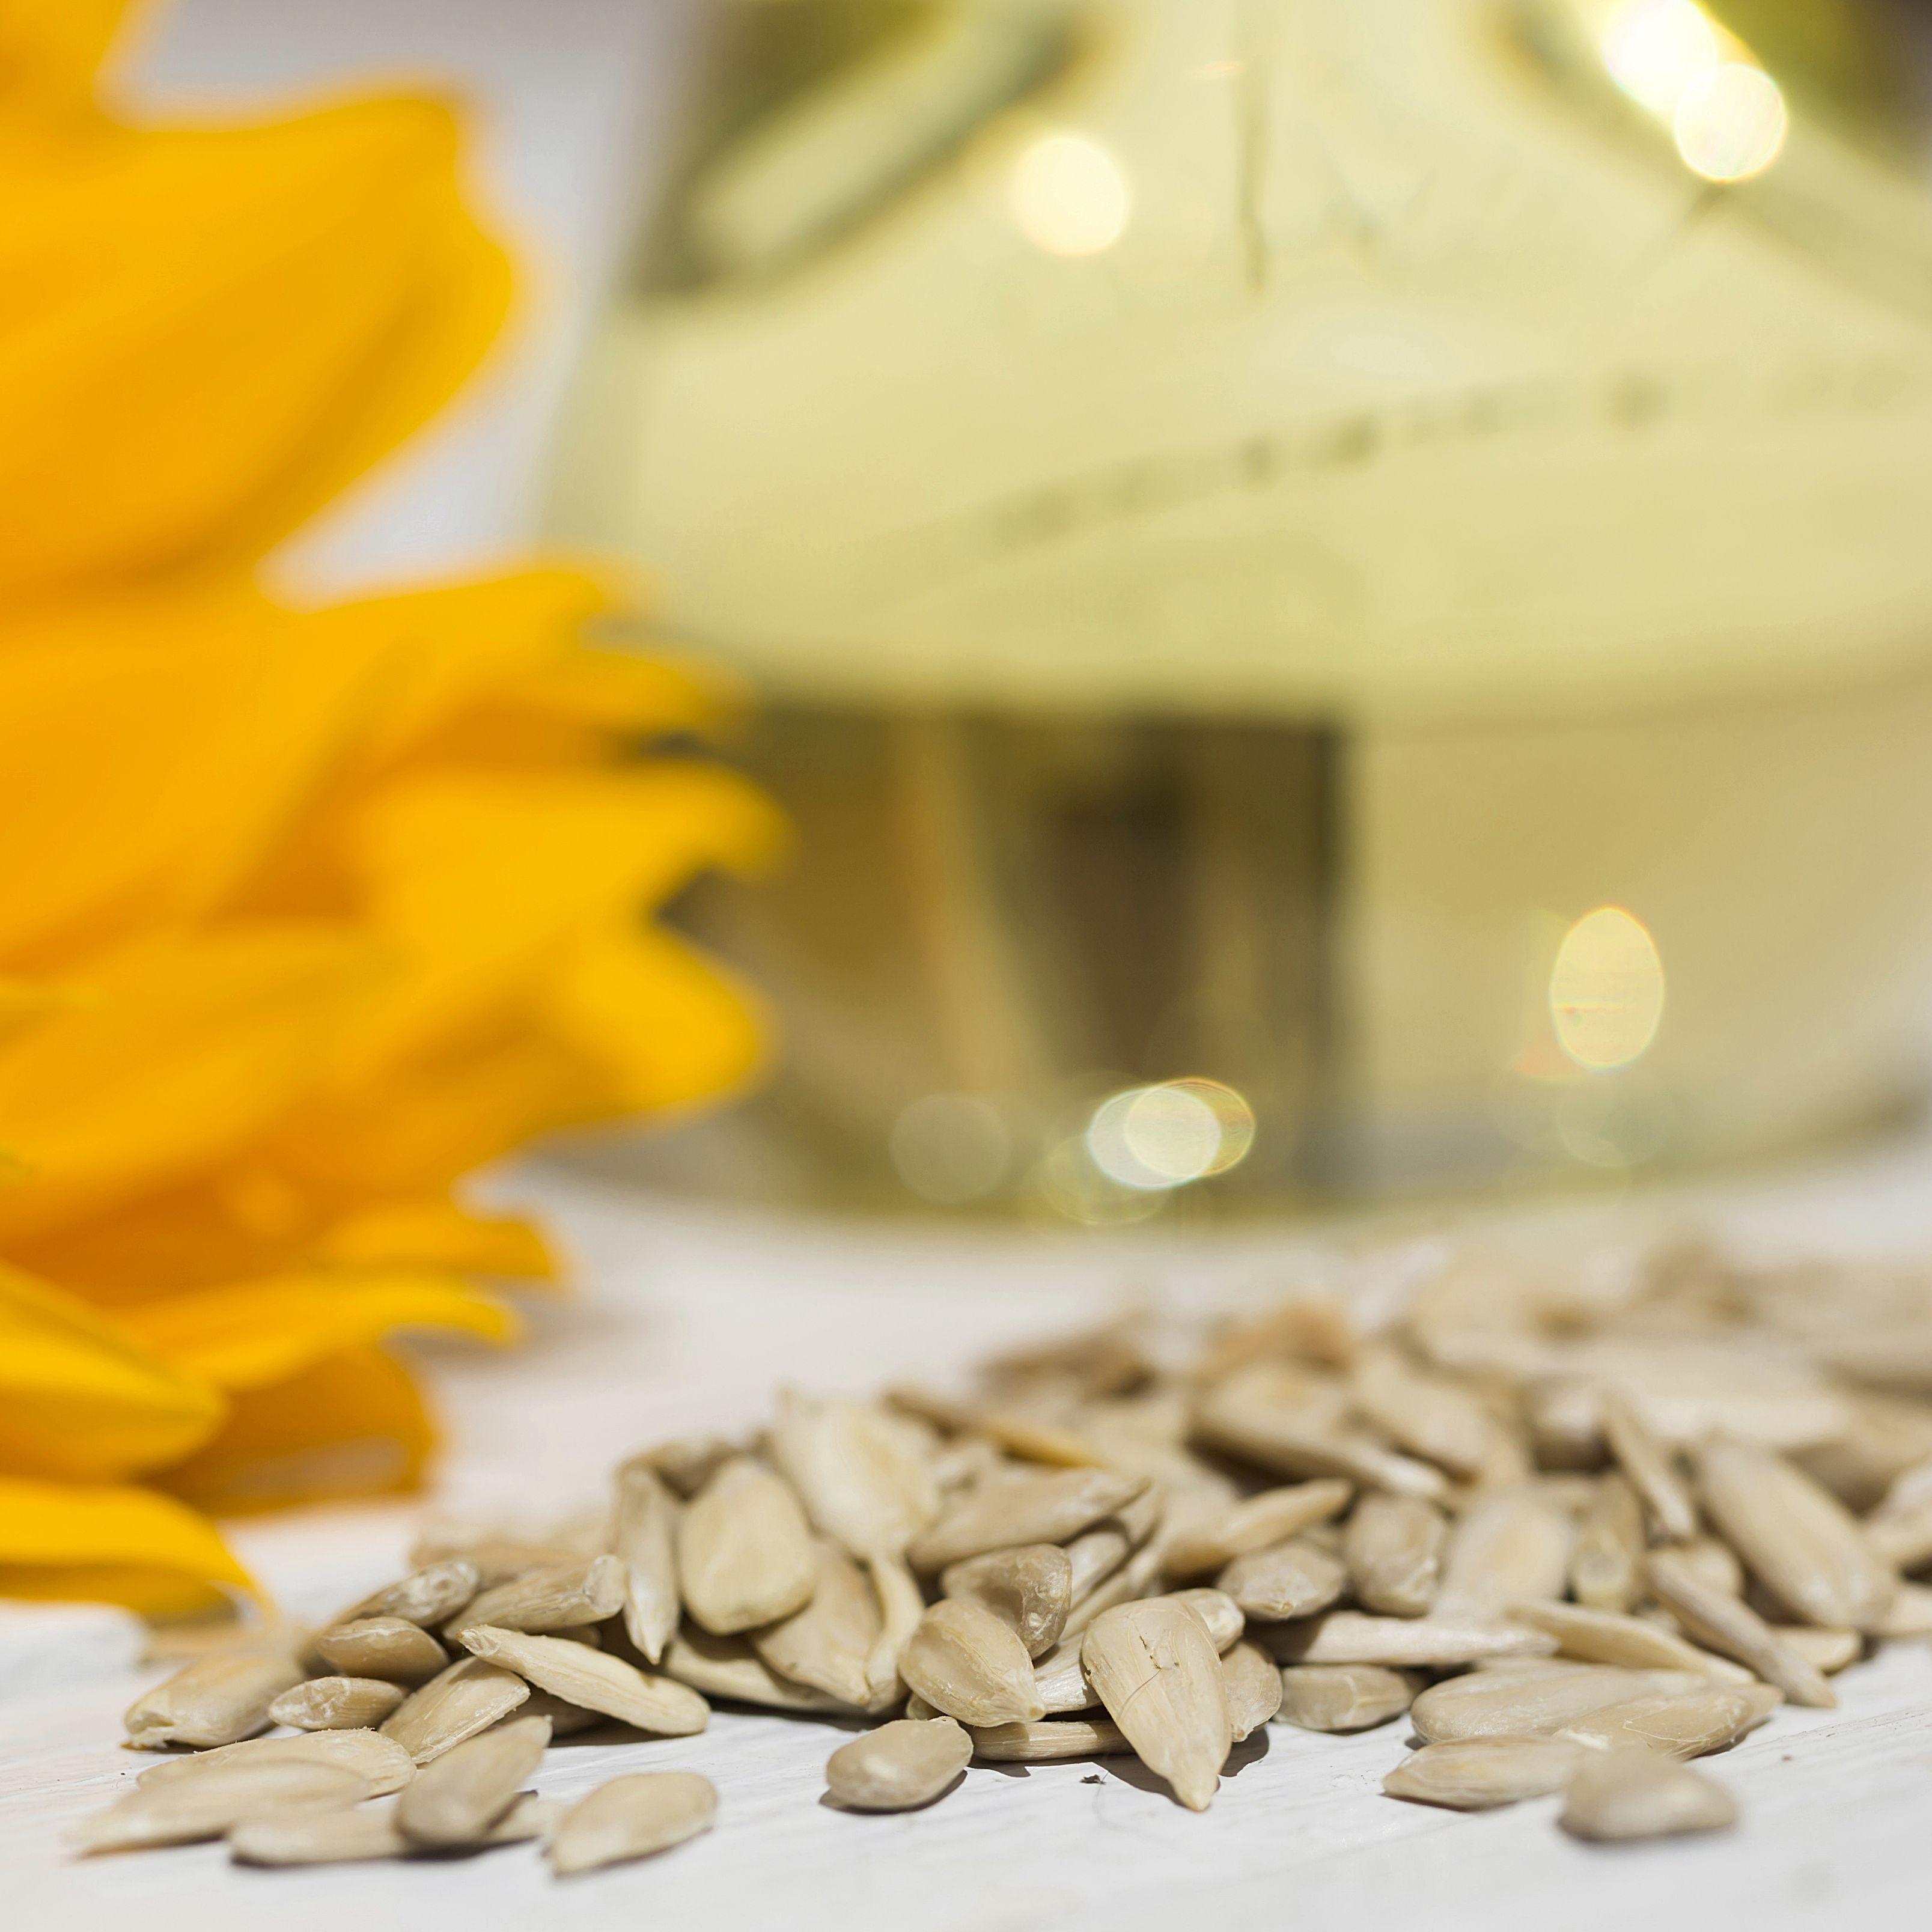 15 Fertility Foods to Boost Fertility Chances